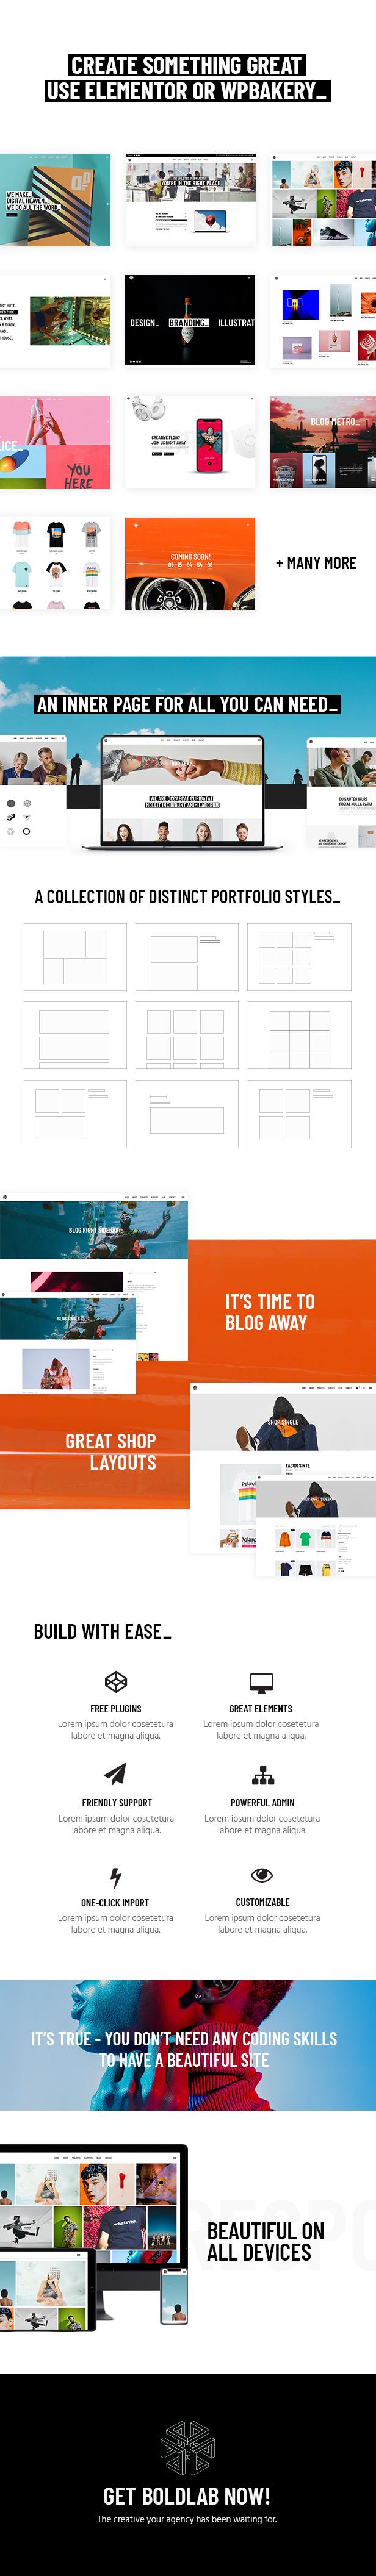 Boldlab - Creative Agency Theme - 1